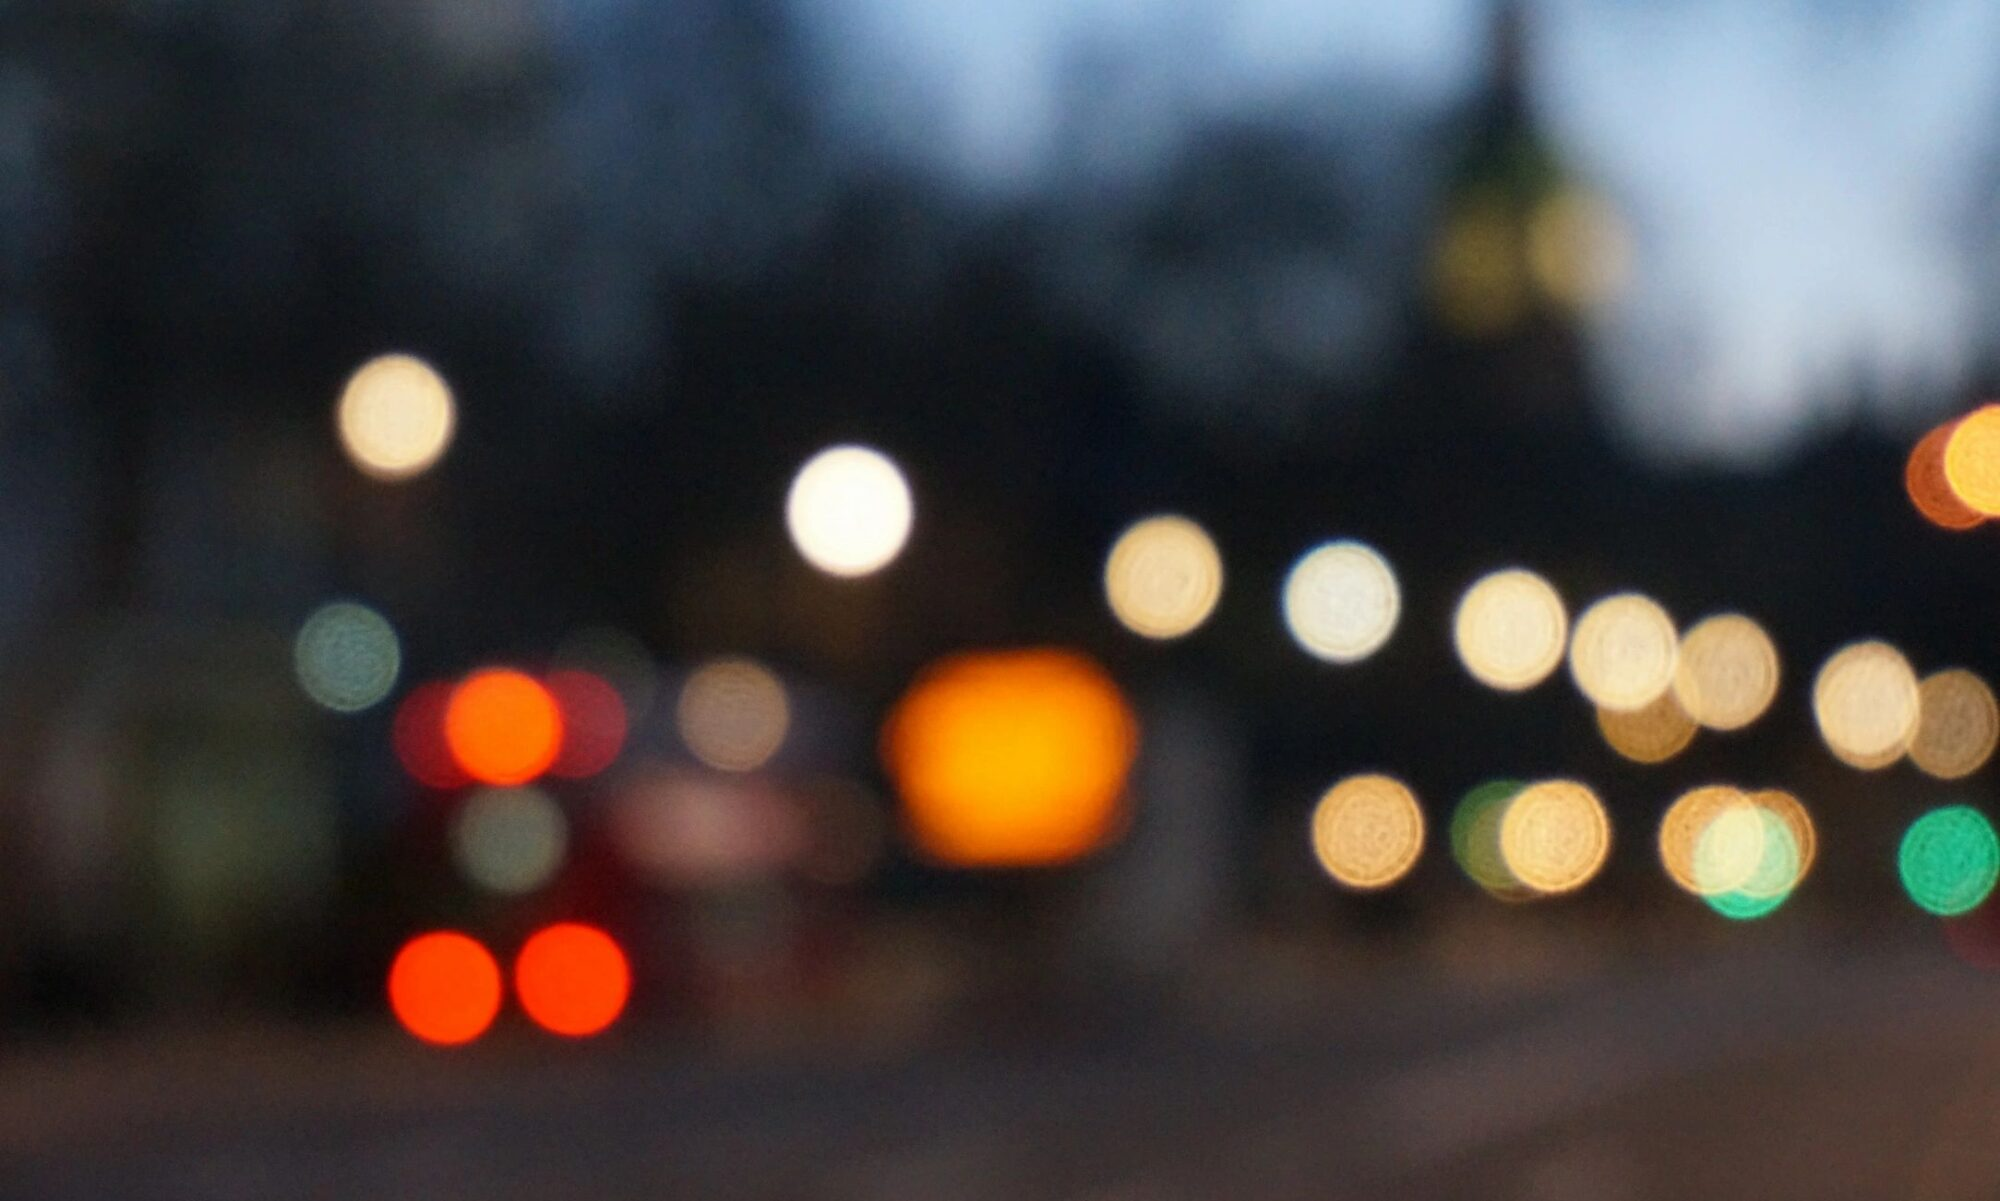 Latest Science & Technology News - Upcoming Gadgets 2020 – KhIcHiDi